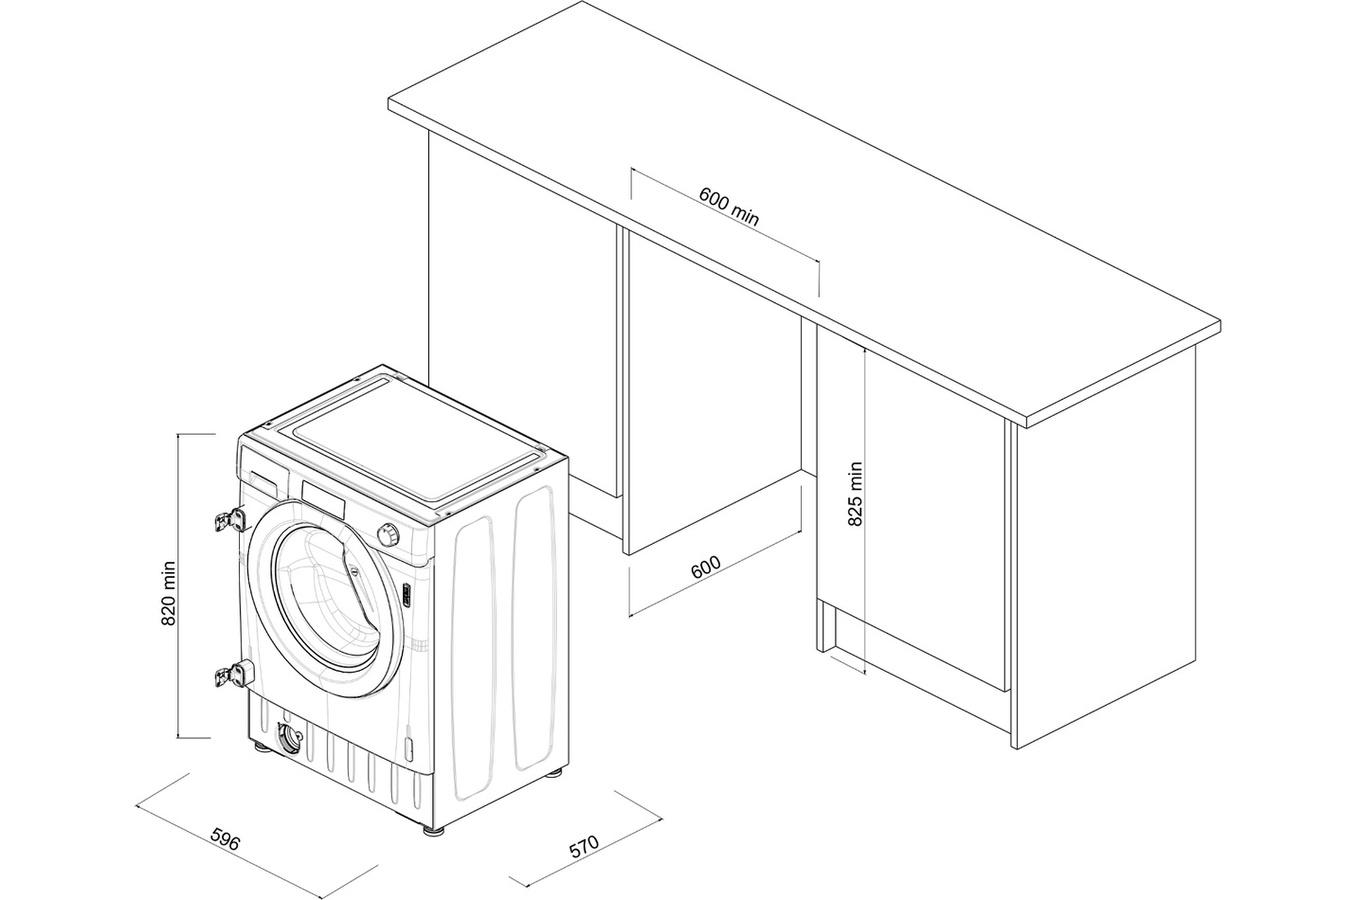 darty lave linge encastrable elegant meuble pour lave. Black Bedroom Furniture Sets. Home Design Ideas